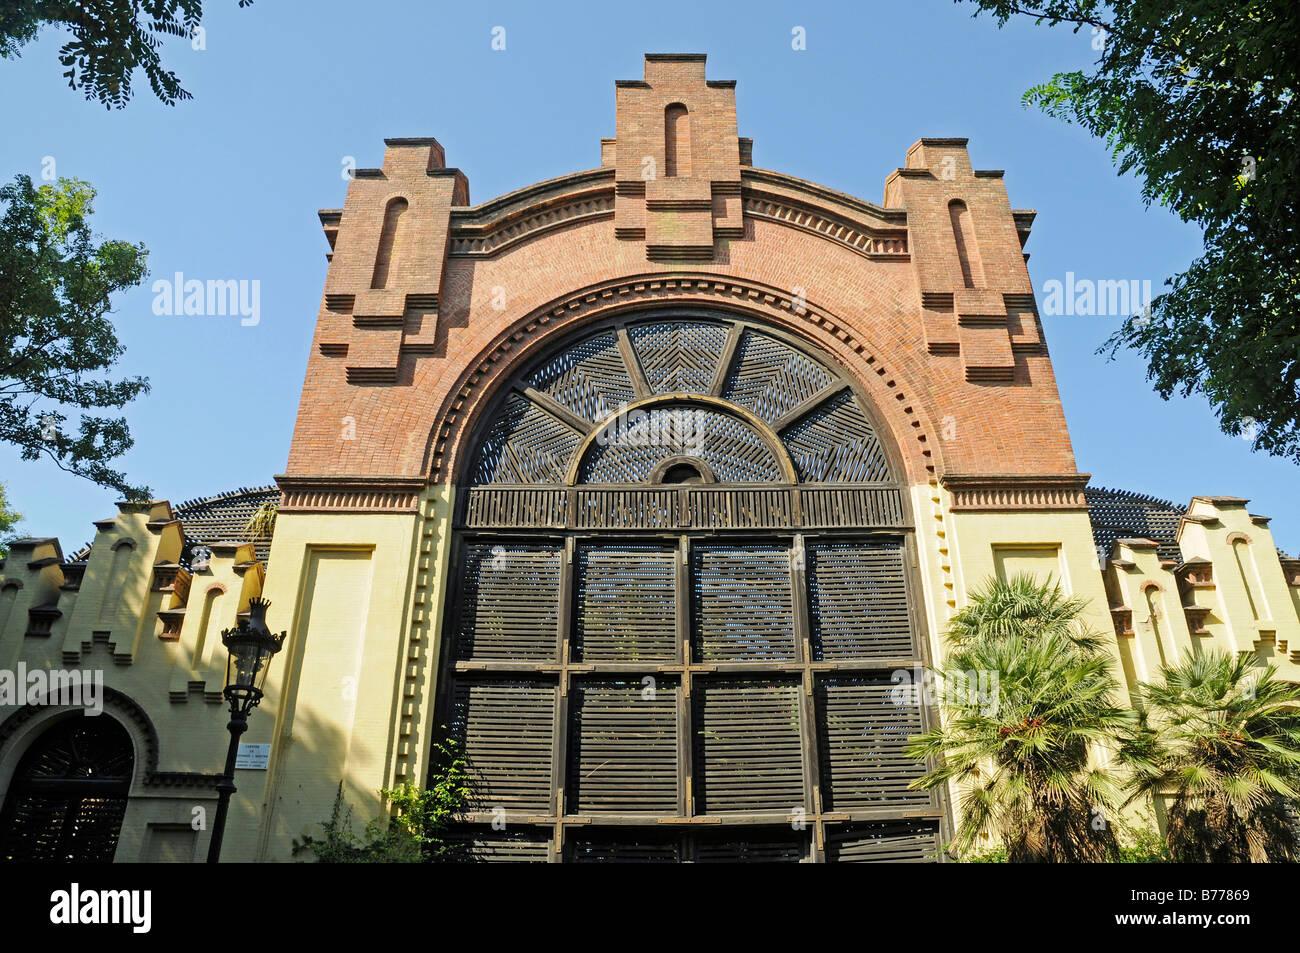 Facade, greenhouse, Jardins de Fontsere i Mestre, architect Josep Fontsere i Mestre, Parc de la Ciutadella, Barcelona, - Stock Image